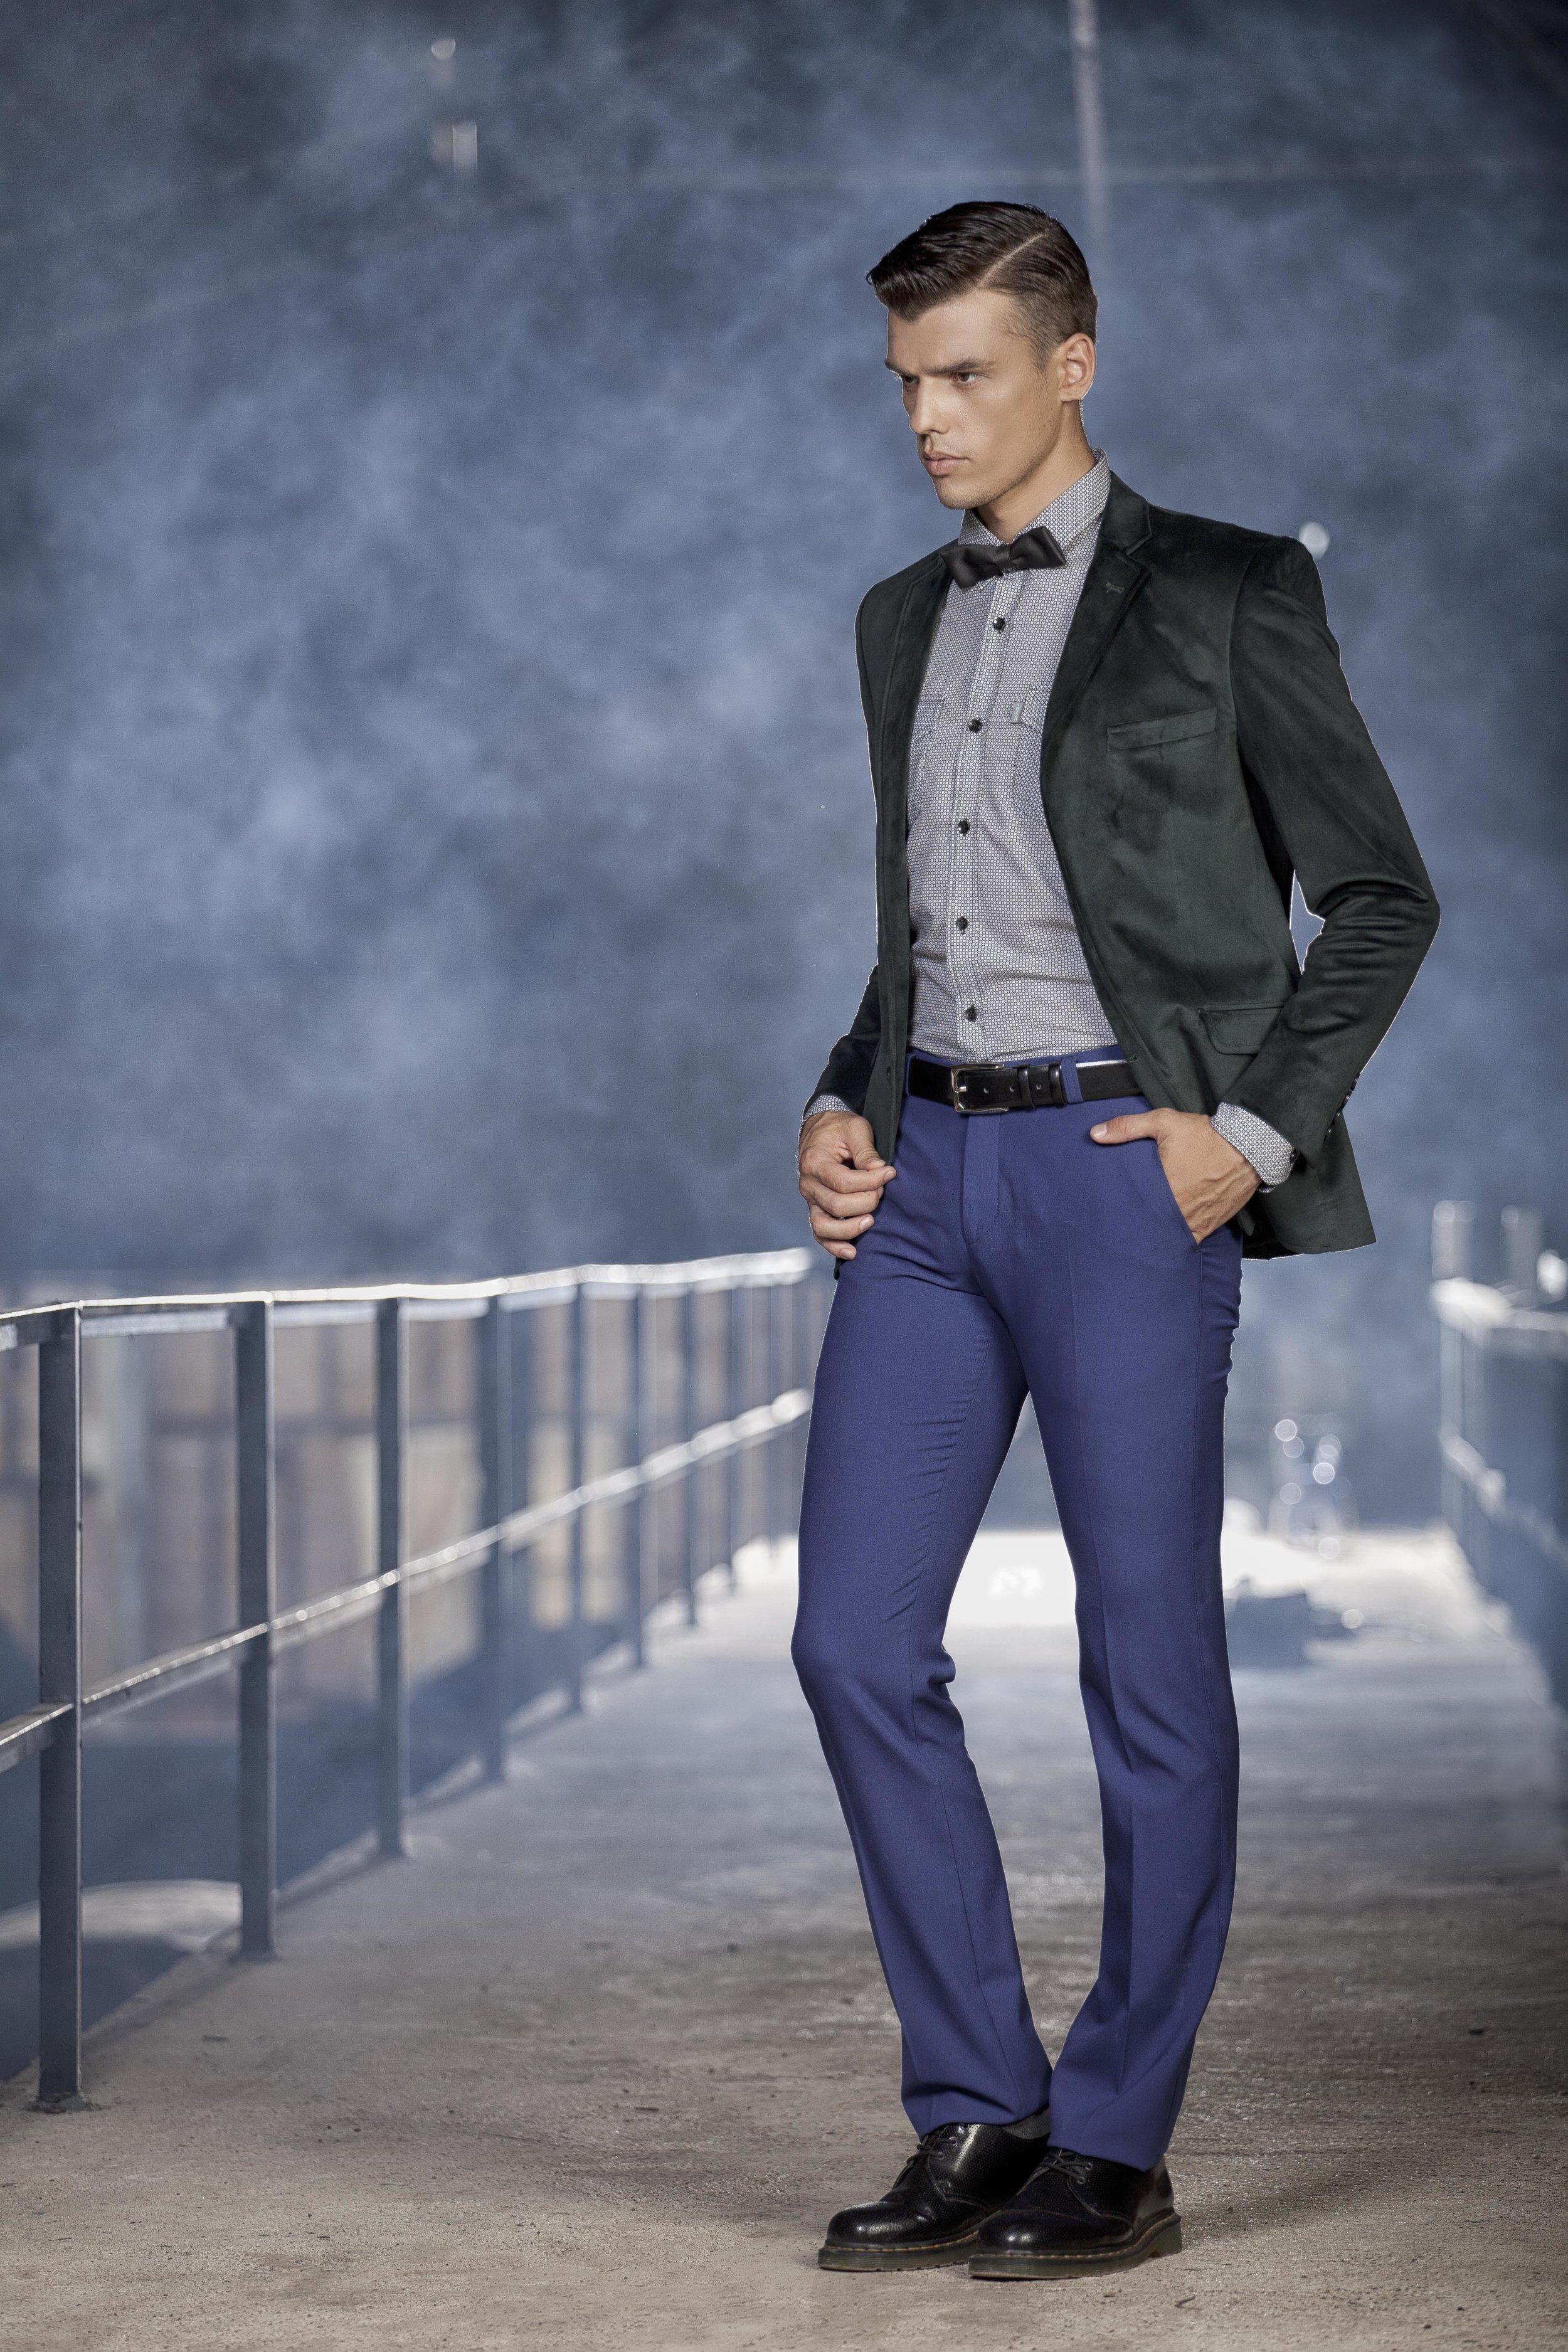 Ugur_Bektas_Fashion_Moda_fotograf_Set_7_0010.jpg